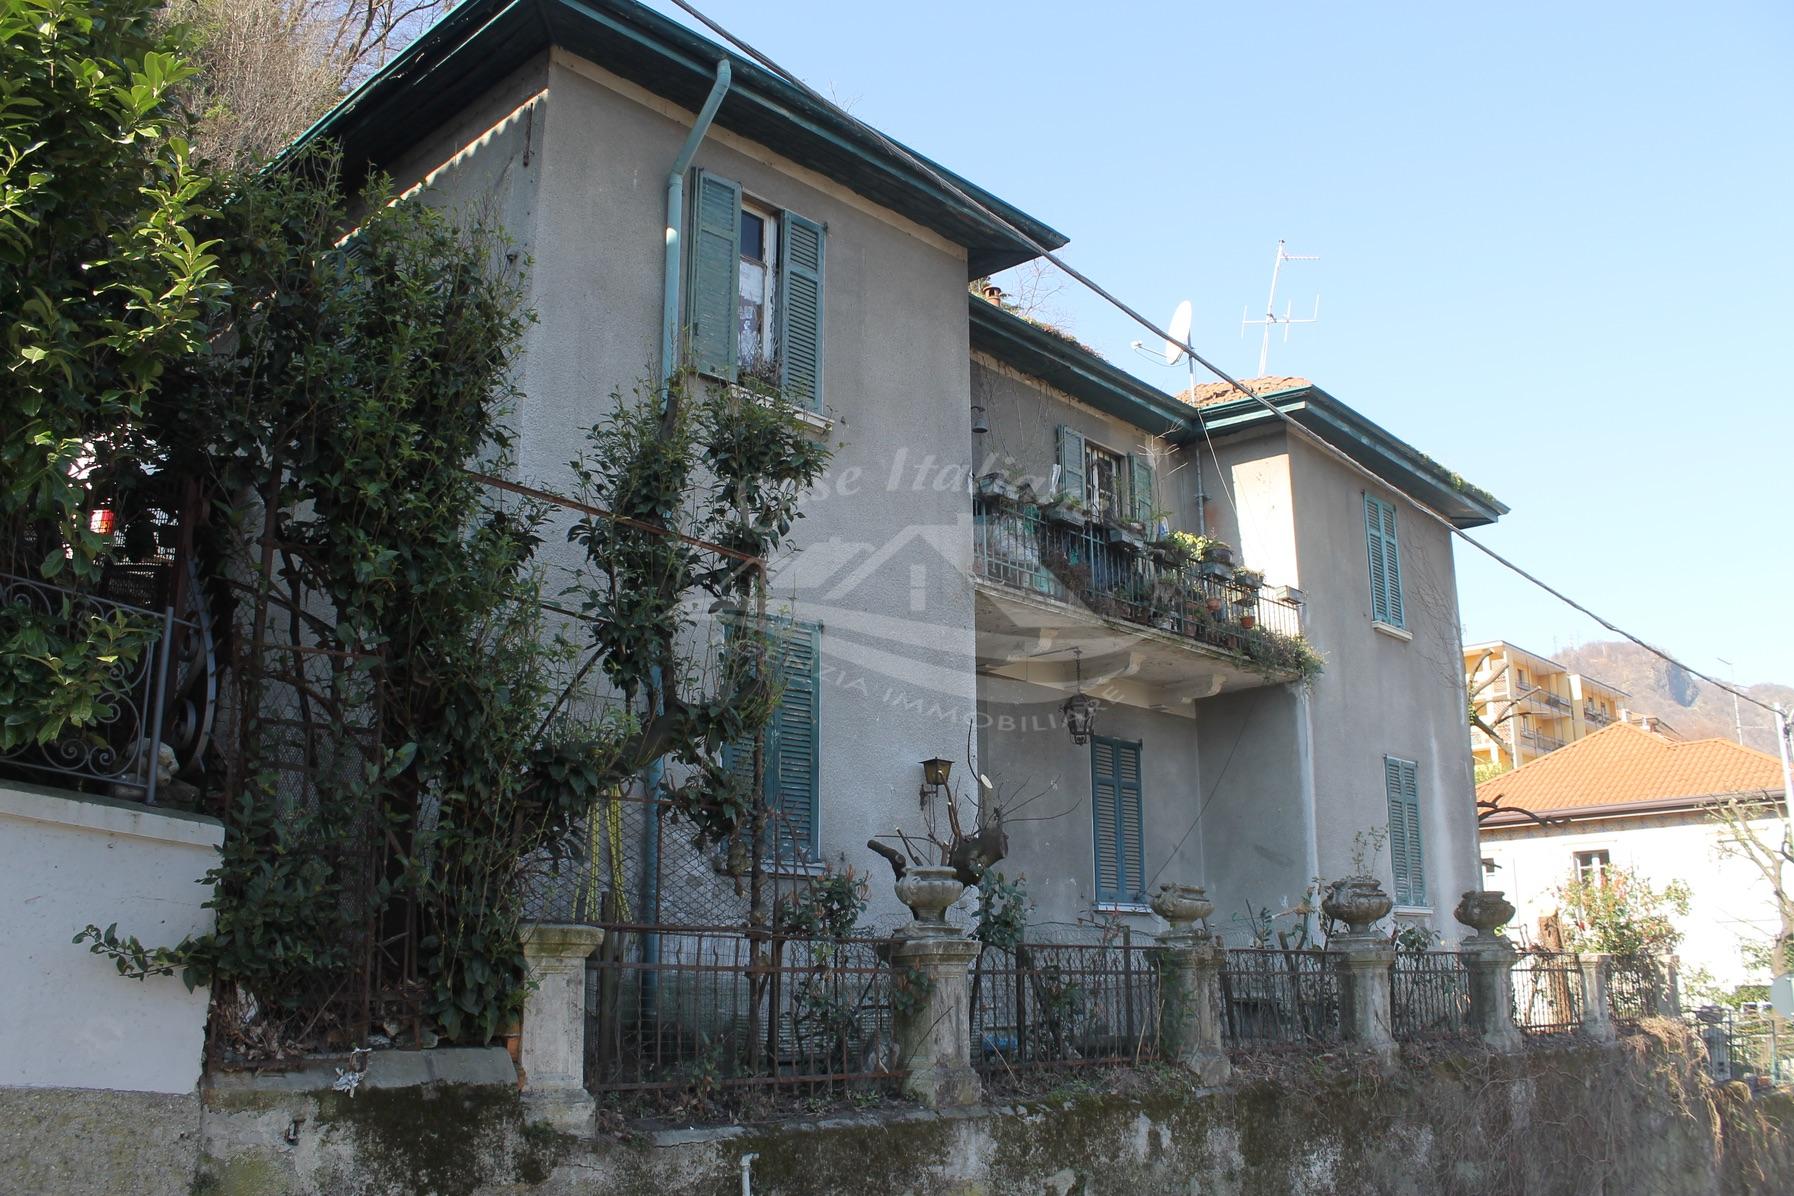 Casa da ristrutturare a Como